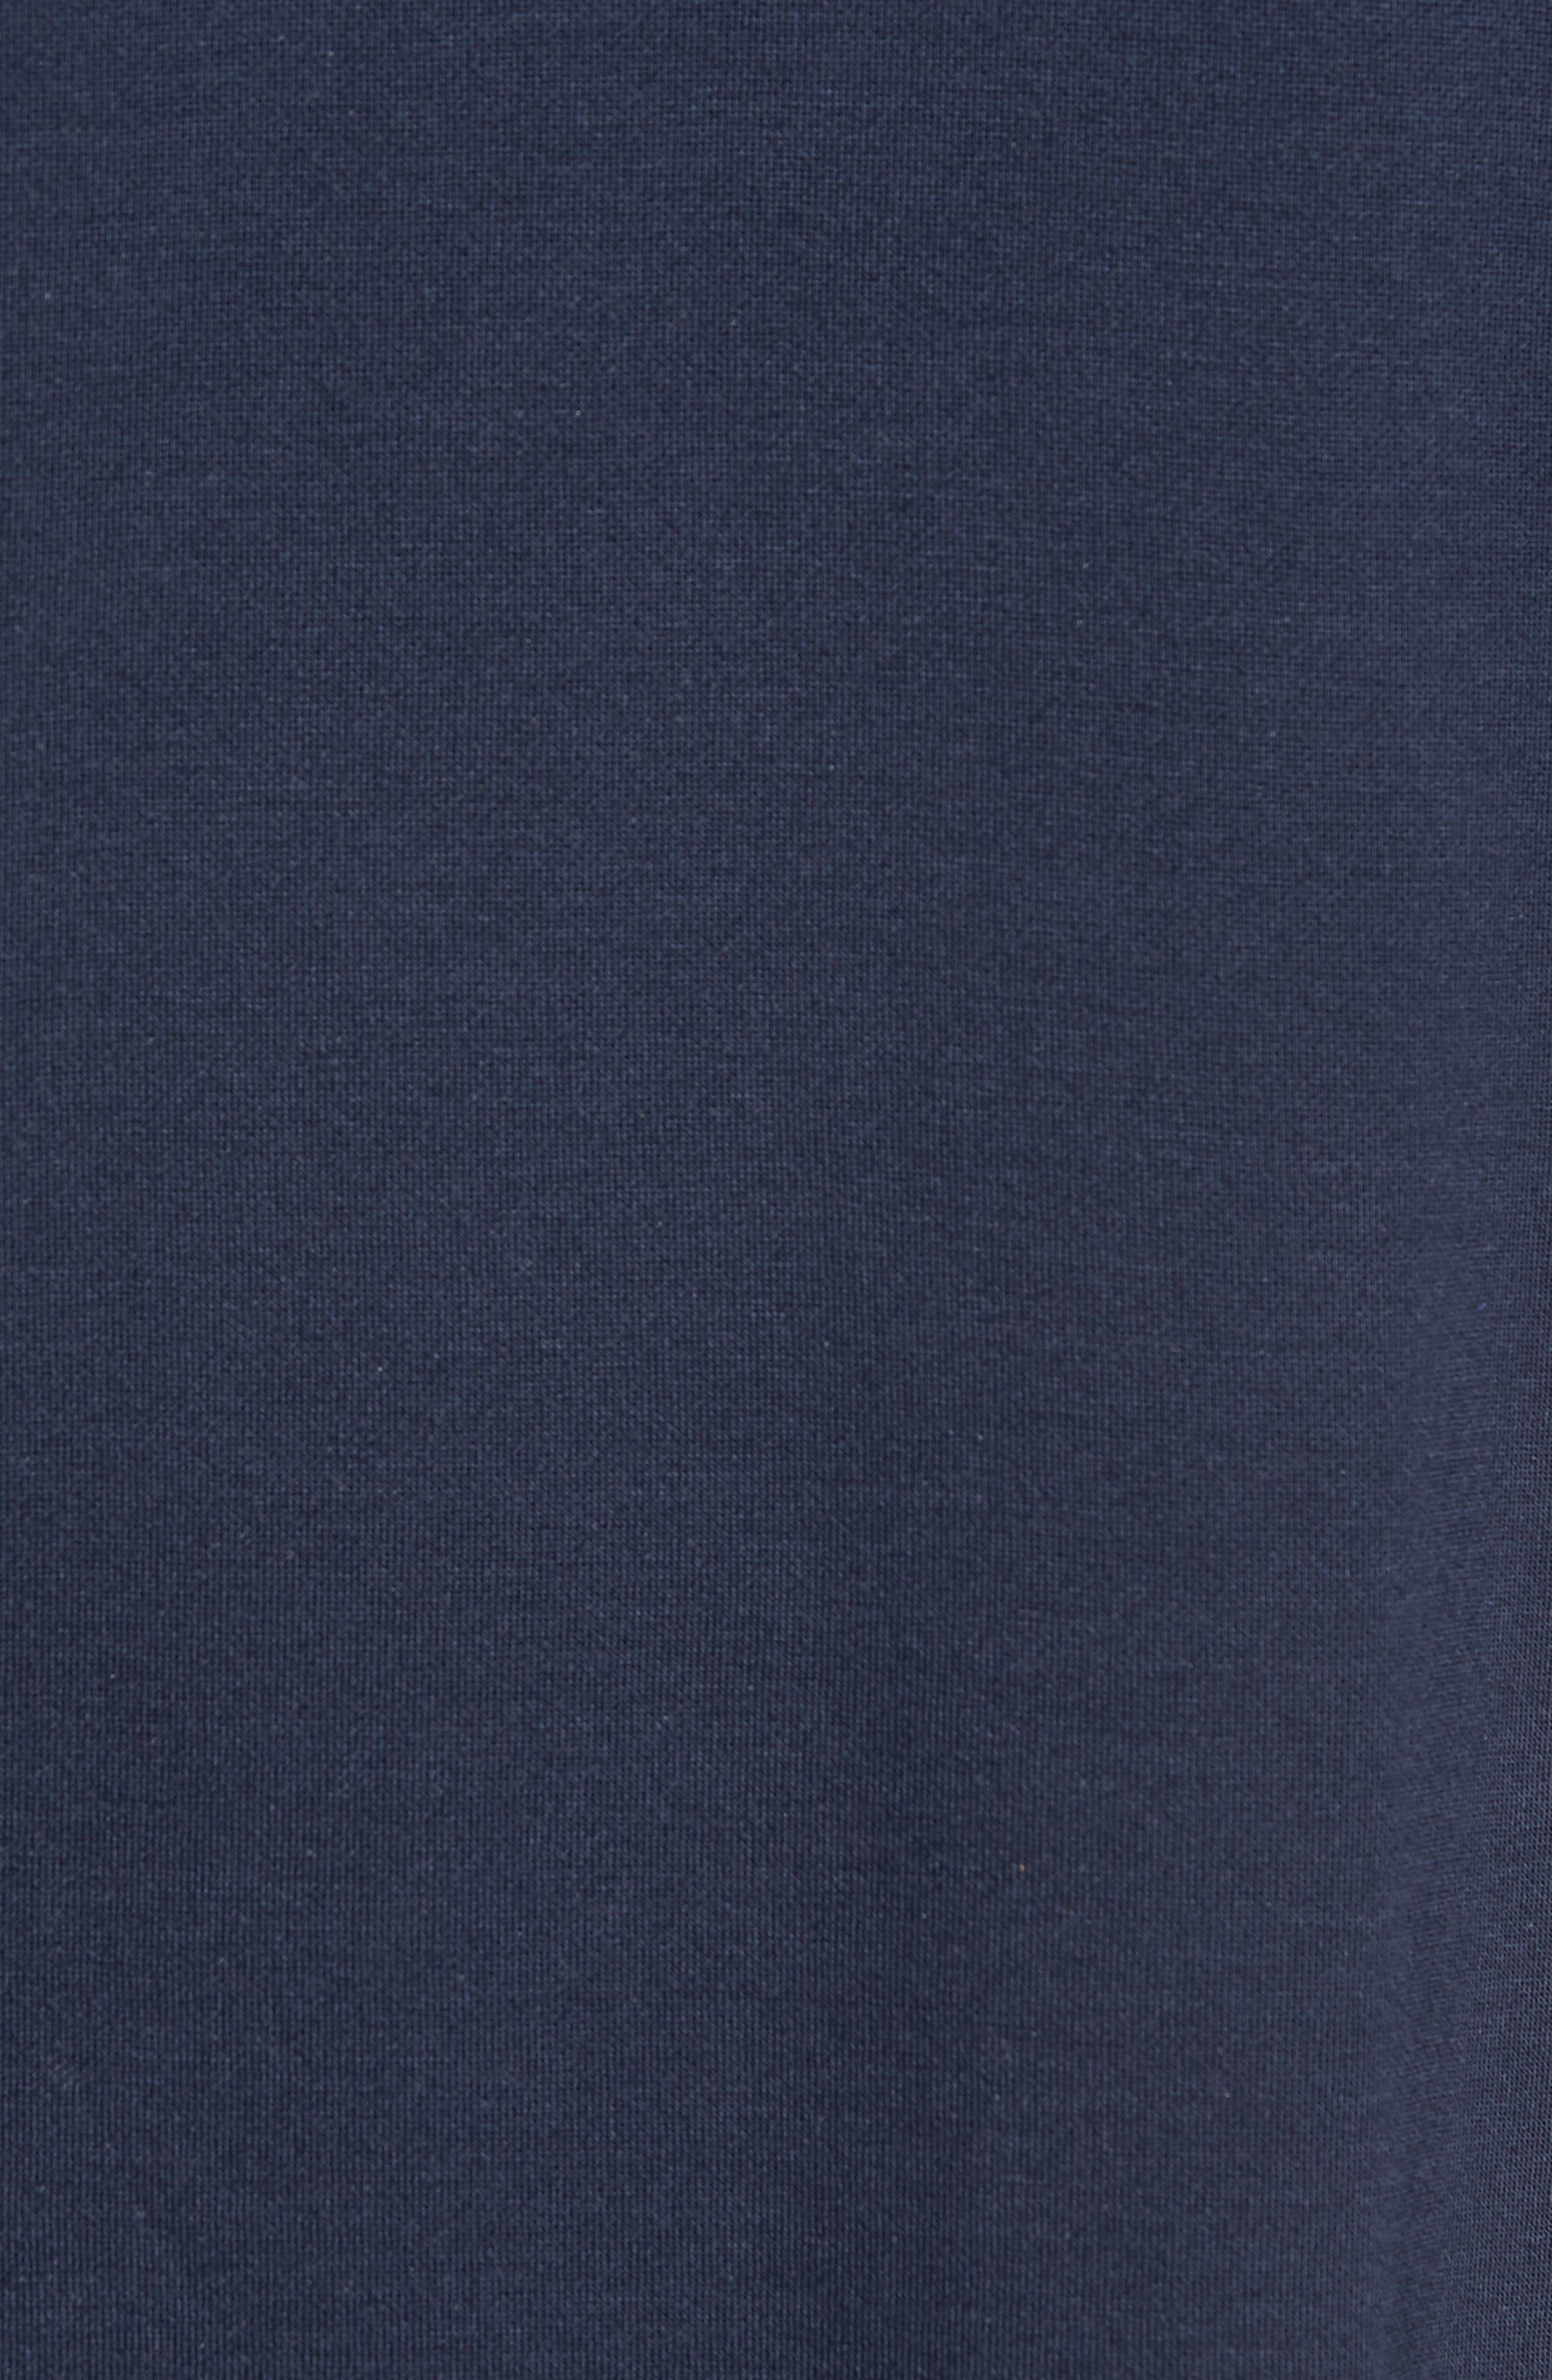 Trim Fit Colorblock Short Sleeve Polo,                             Alternate thumbnail 5, color,                             Navy Black